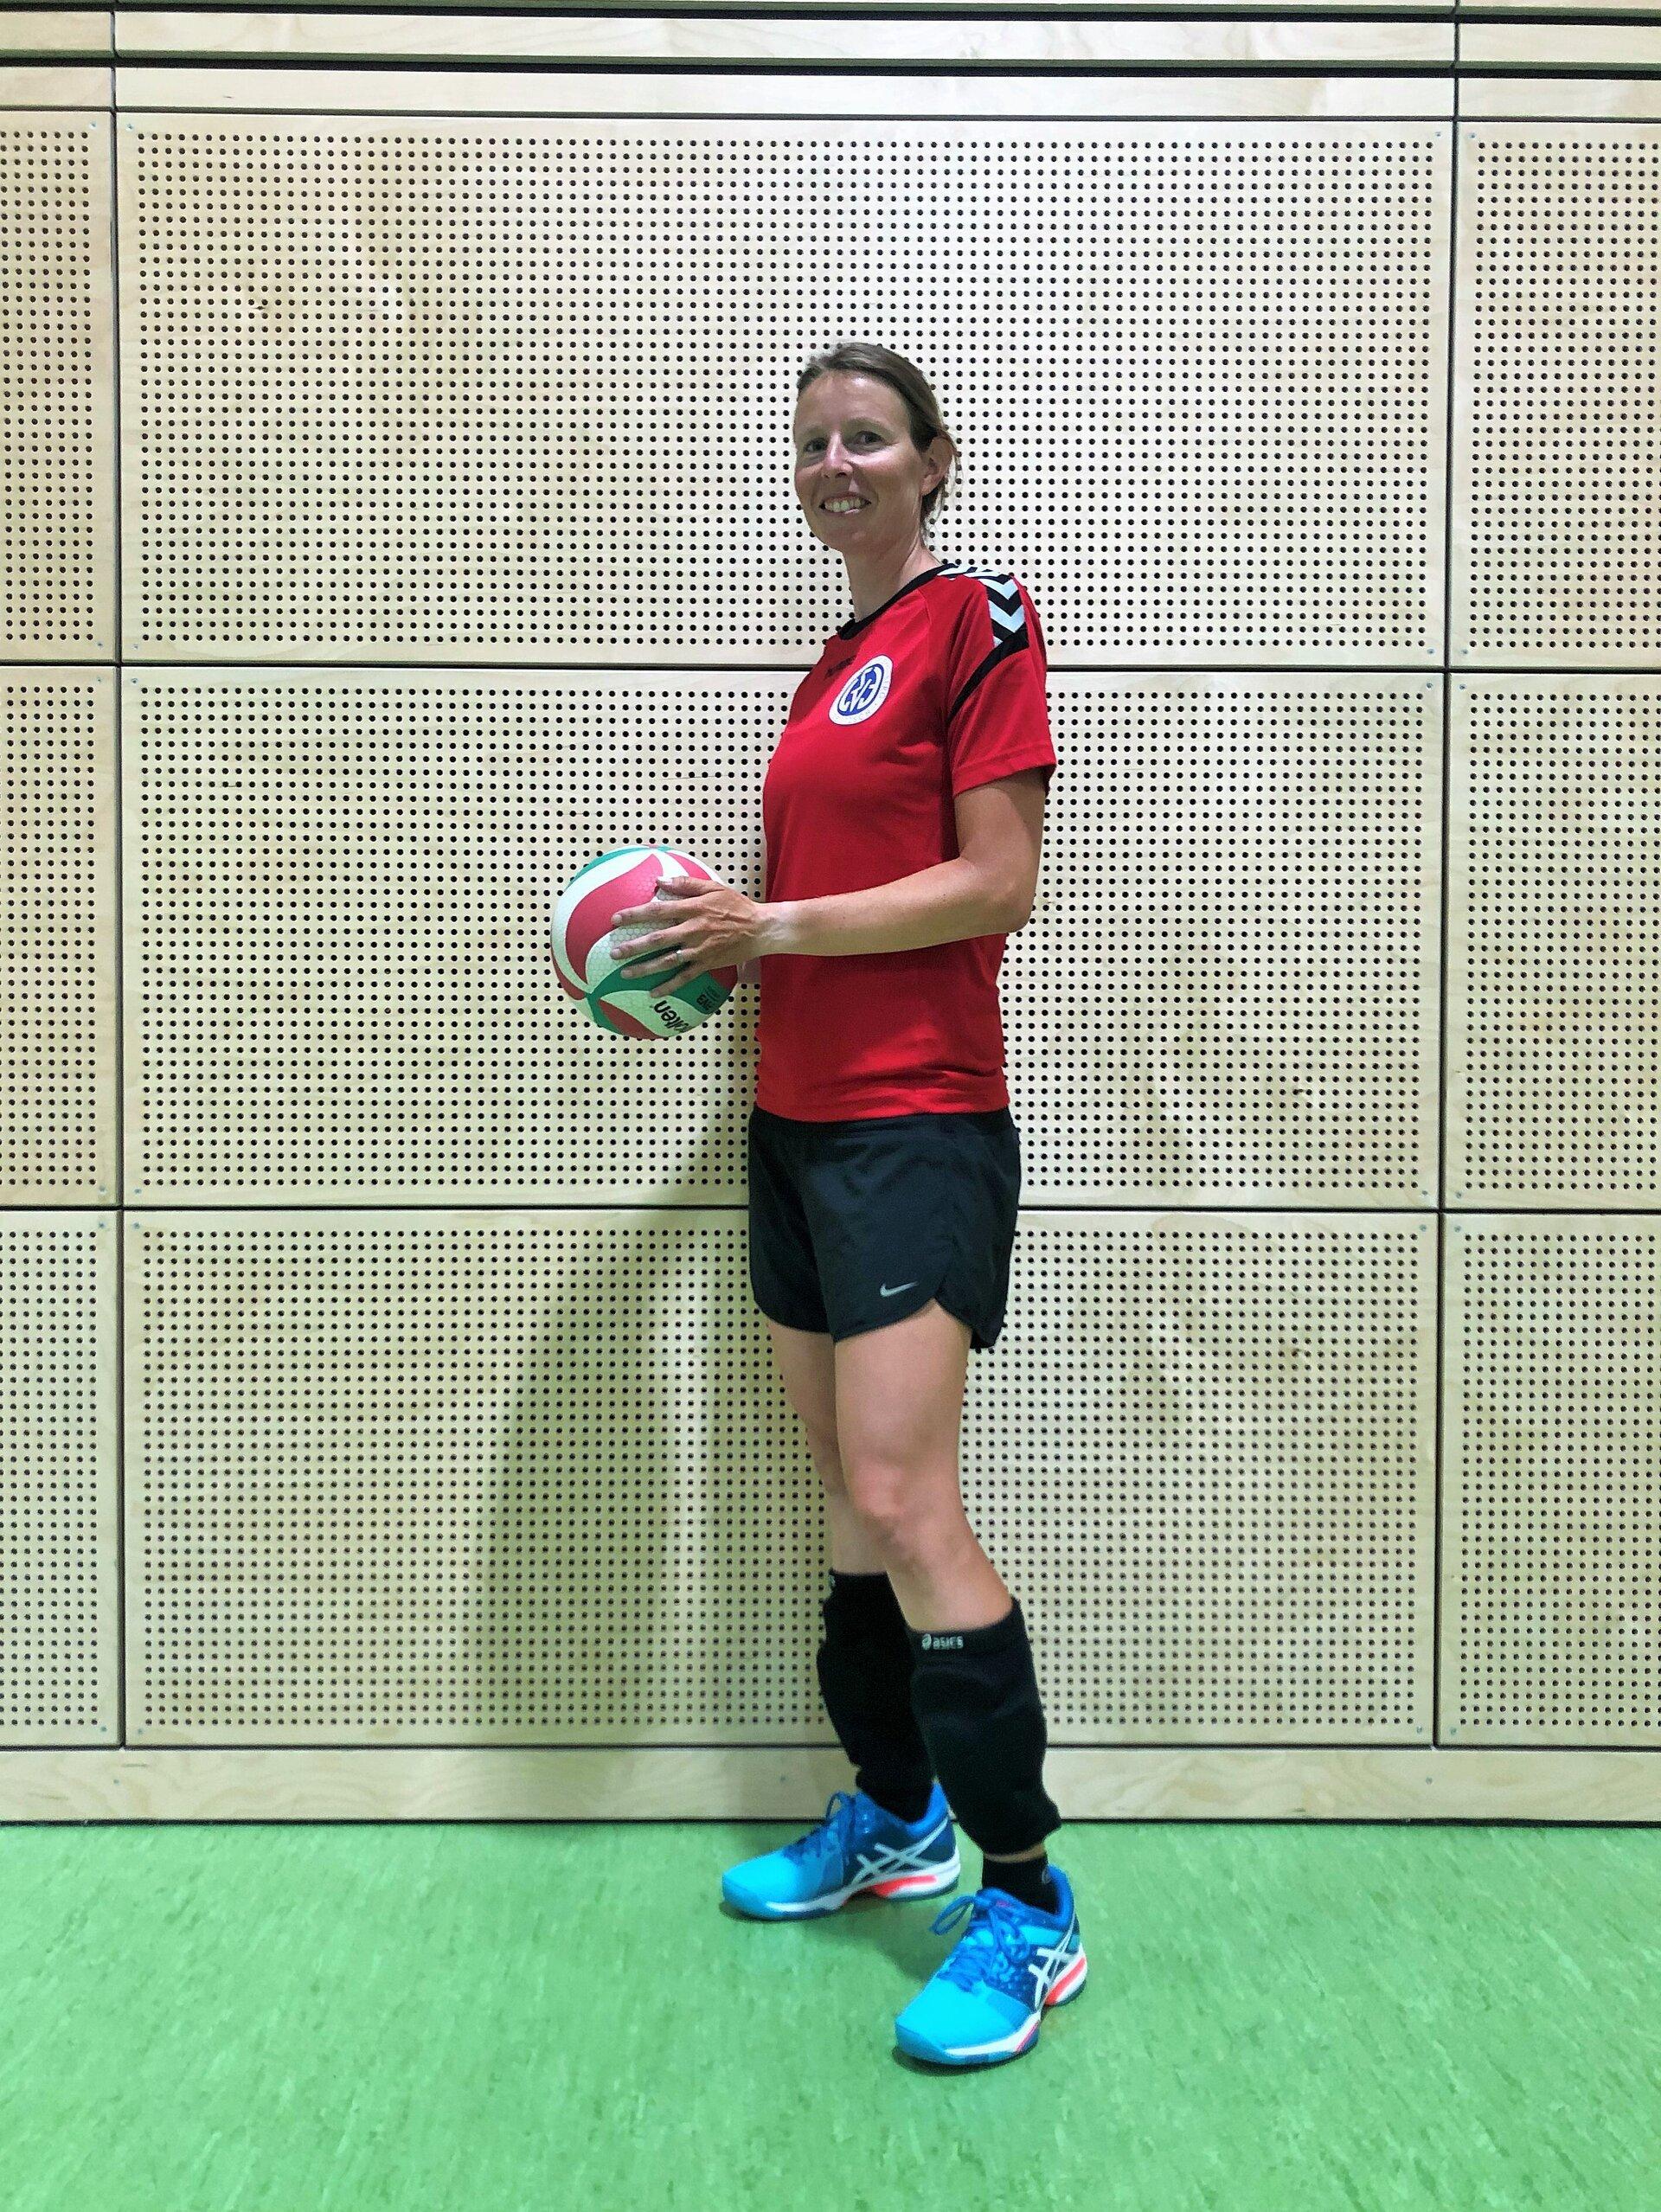 Kathi Neumann